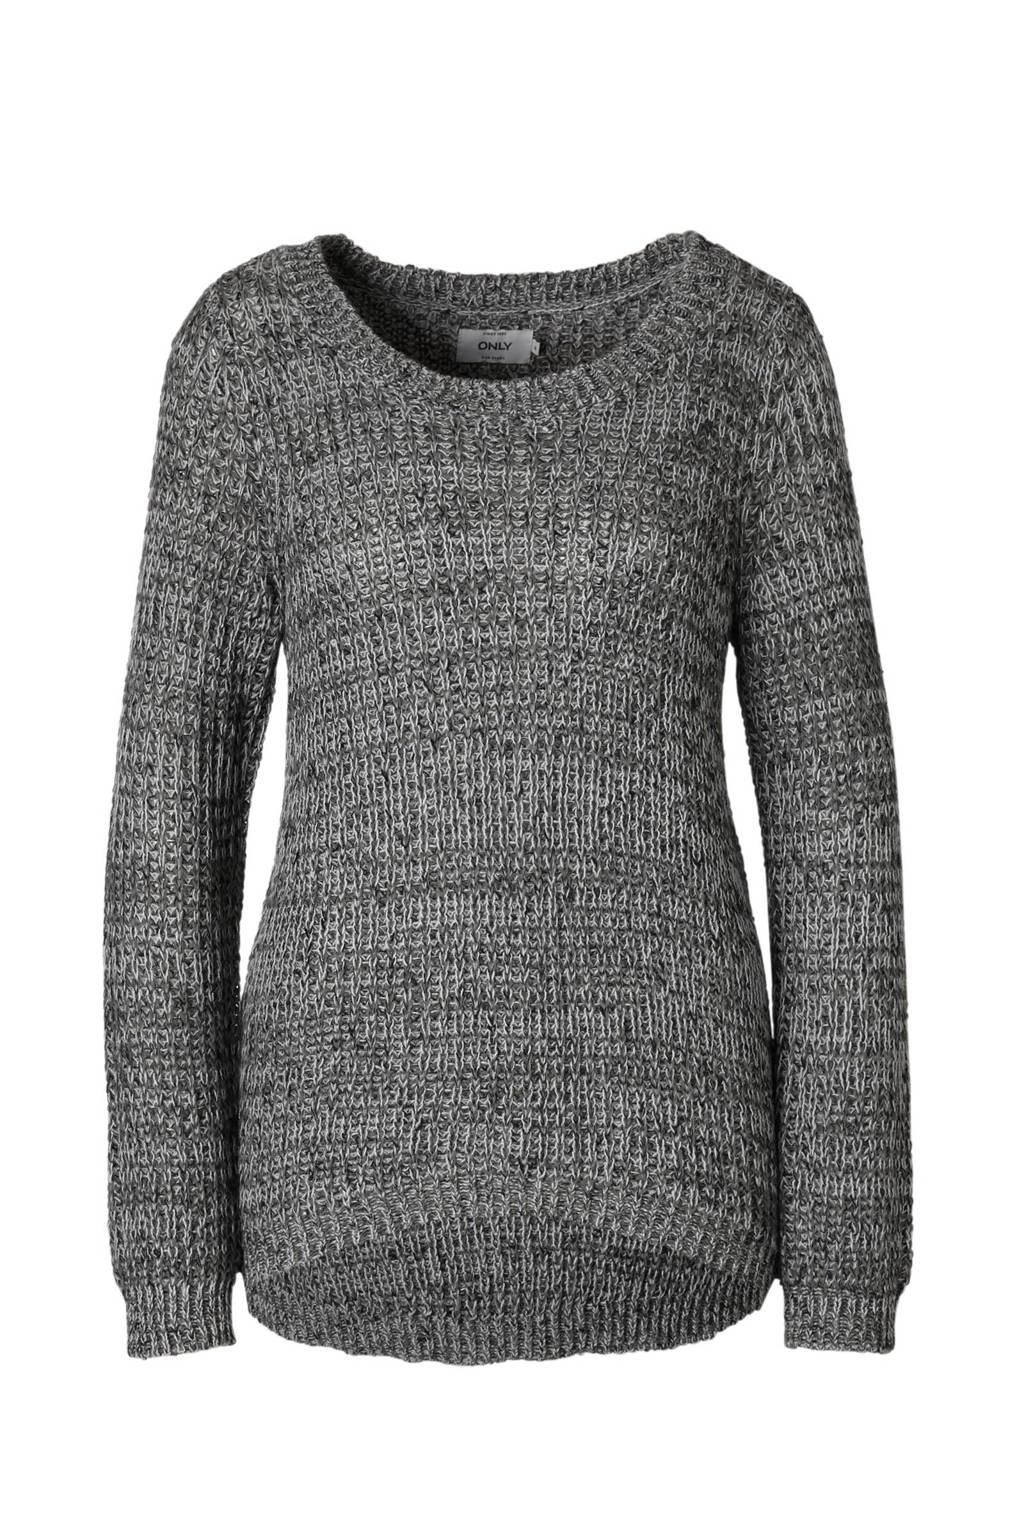 Lange Sweater Trui.Only Lange Trui Wehkamp